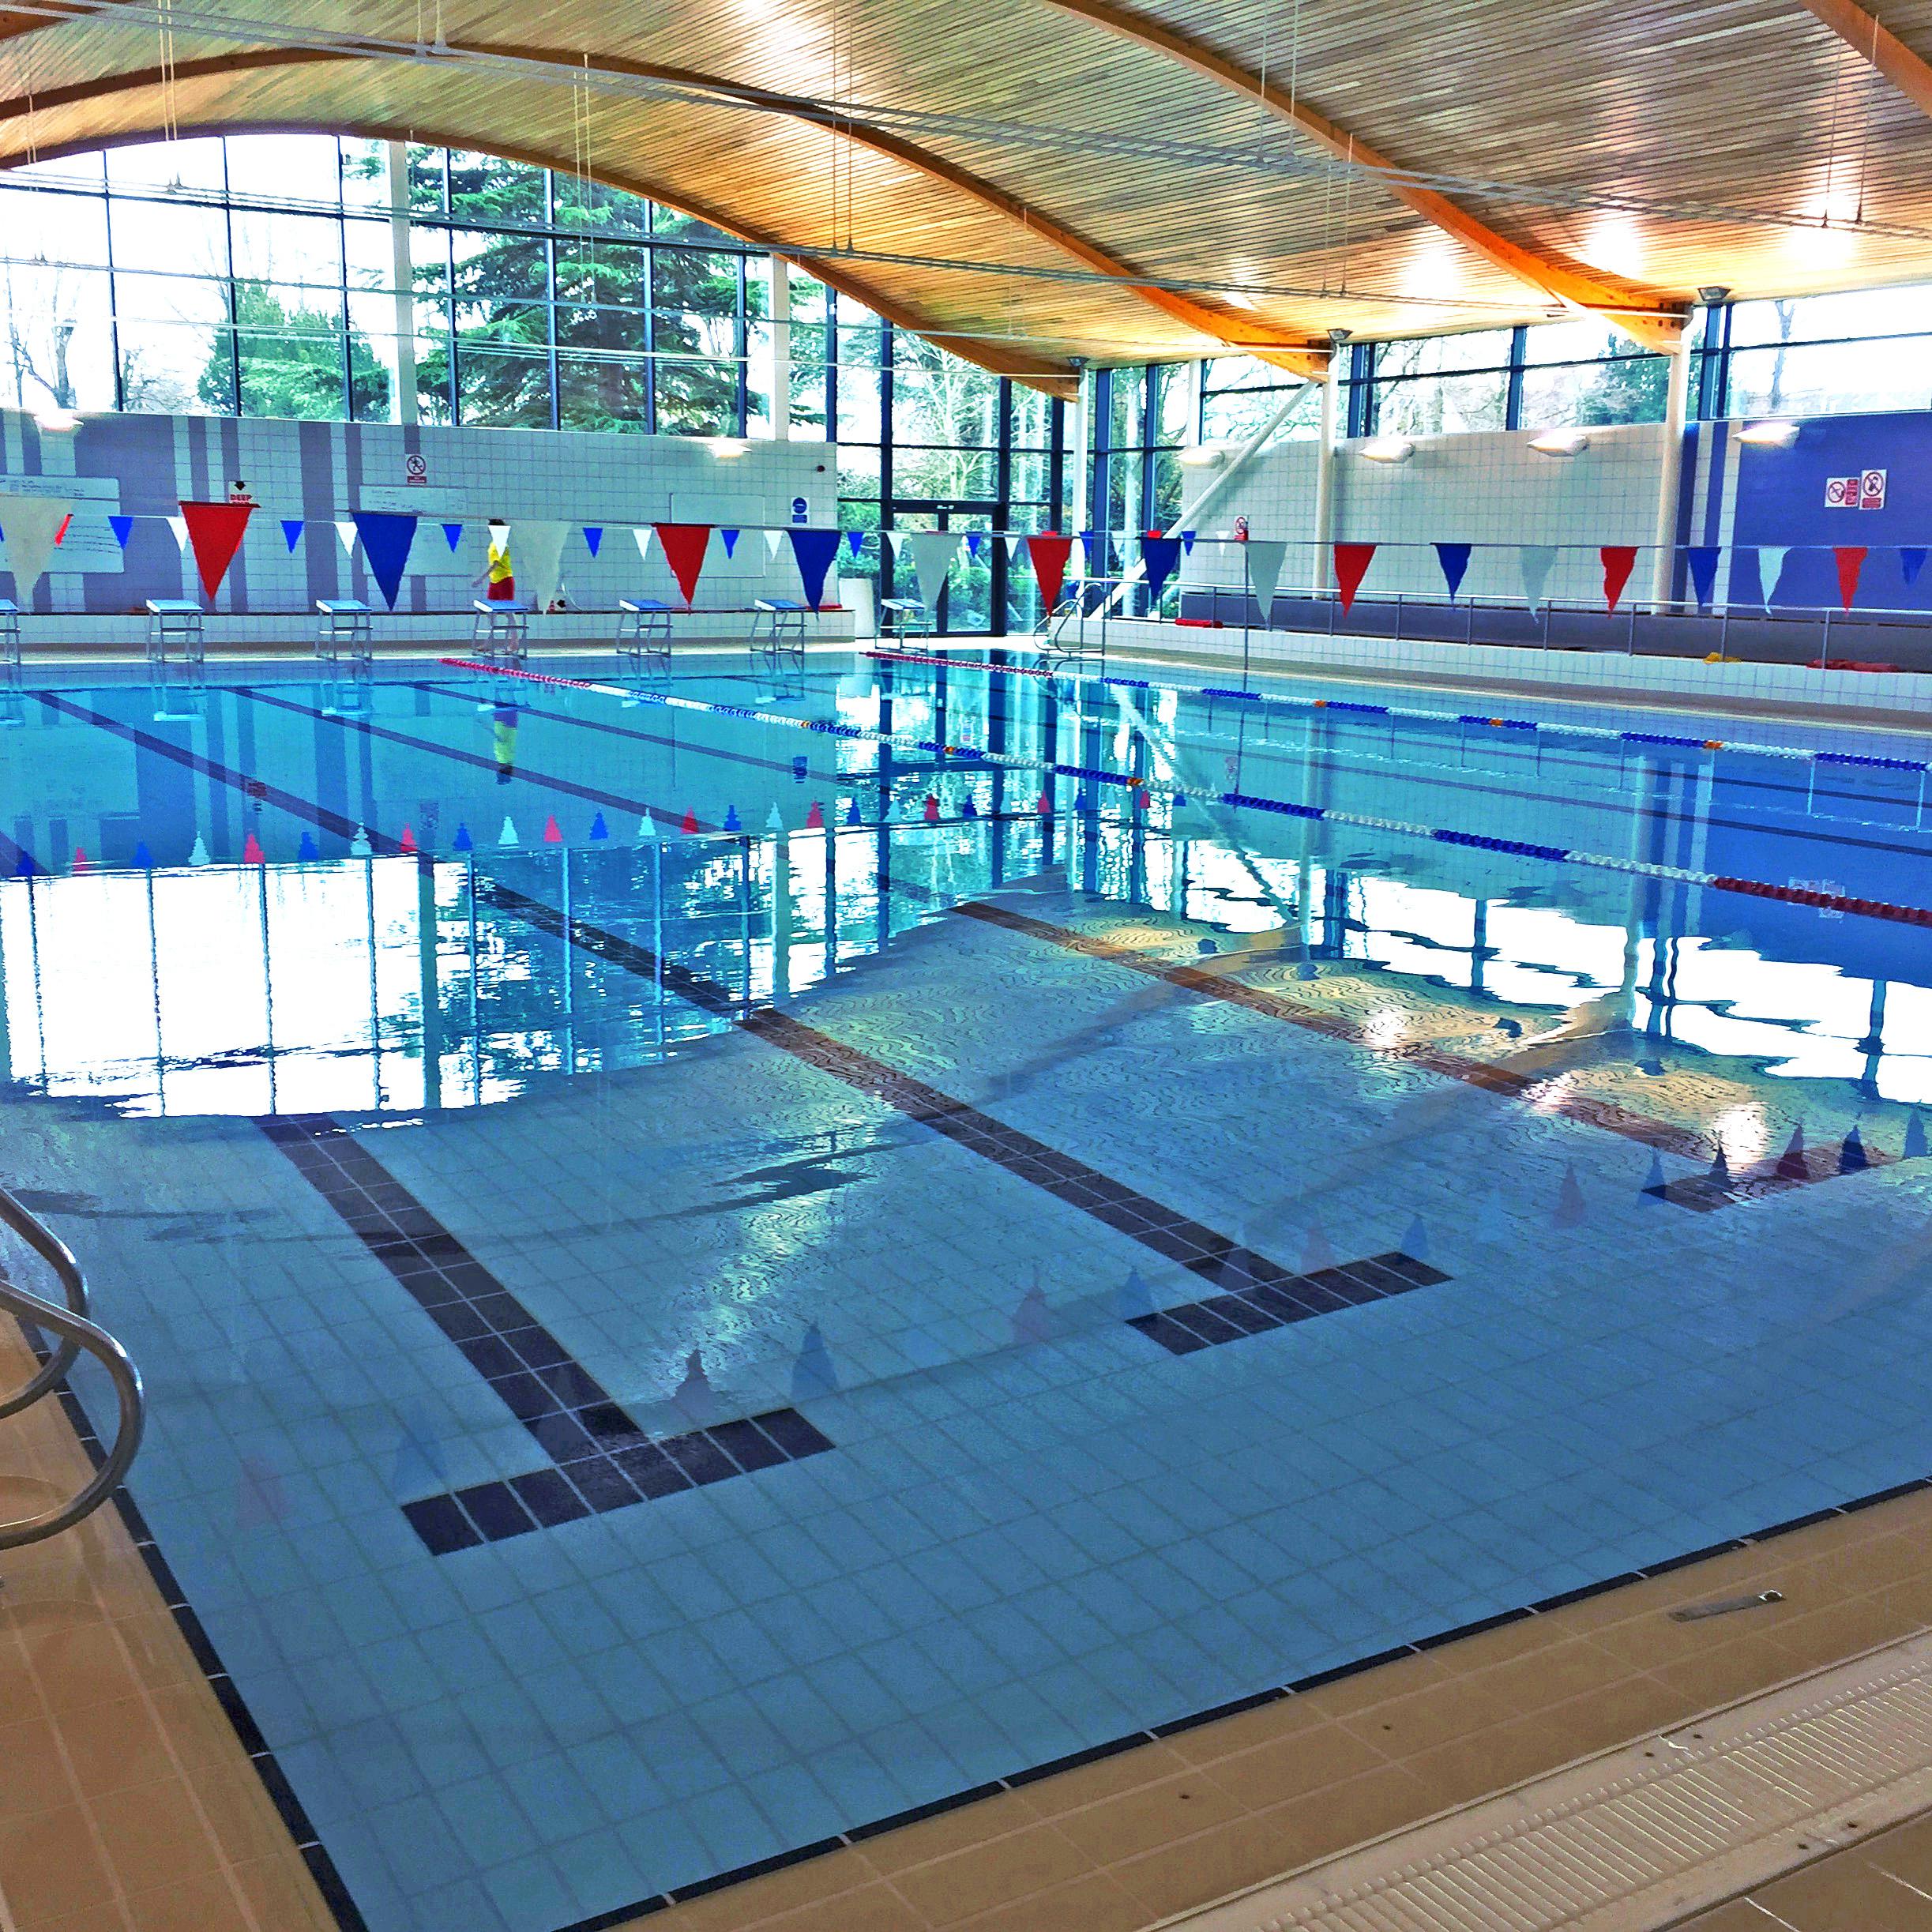 Abingdon swimming lessons kick n splash childrens swimming lessons in oxfordshire for Abingdon swimming pool opening times